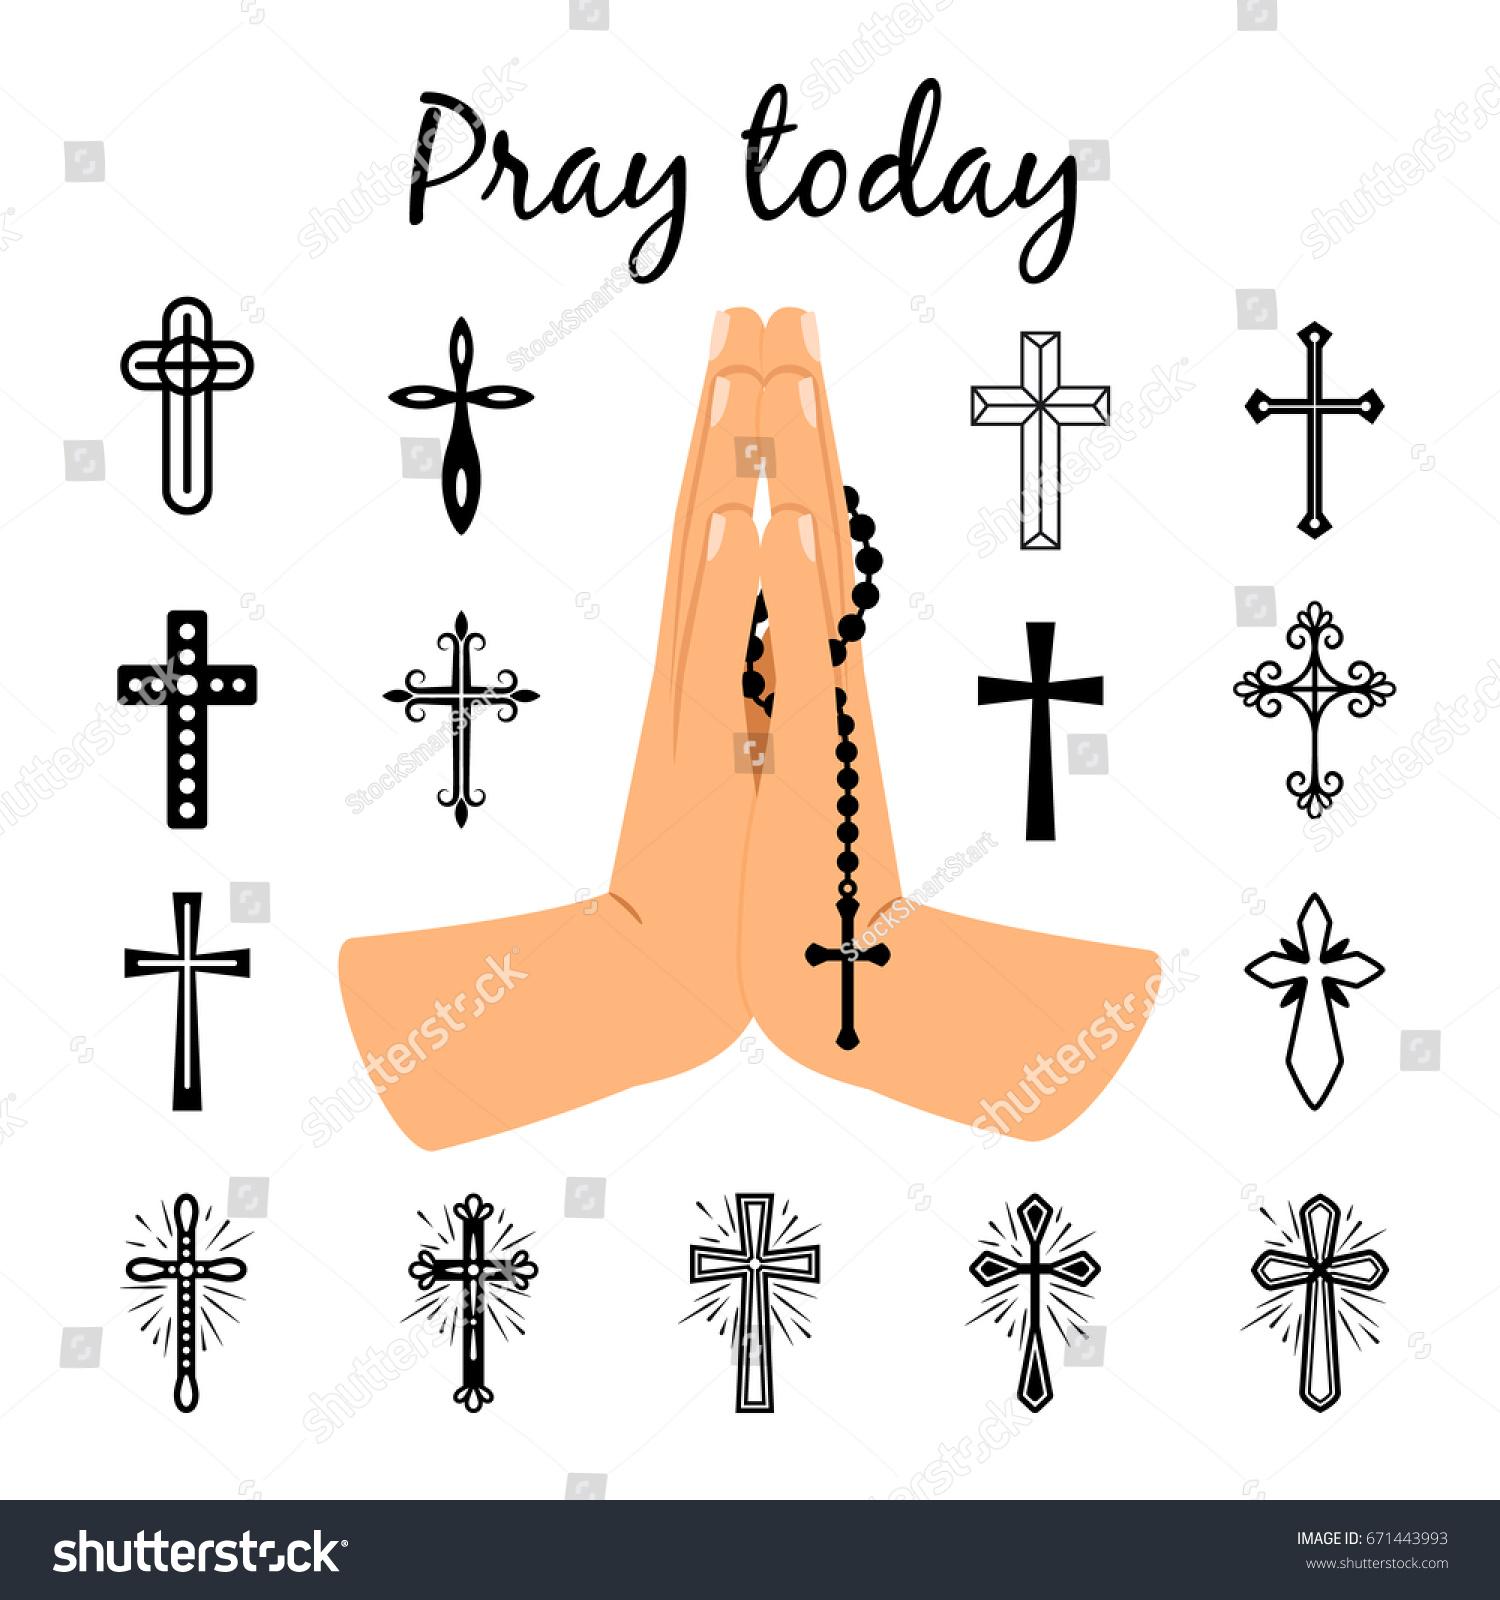 Catholic praying hands holding rosary beads stock vector 671443993 catholic praying hands holding rosary beads and christian crosses signs vector prayer symbols isolated on buycottarizona